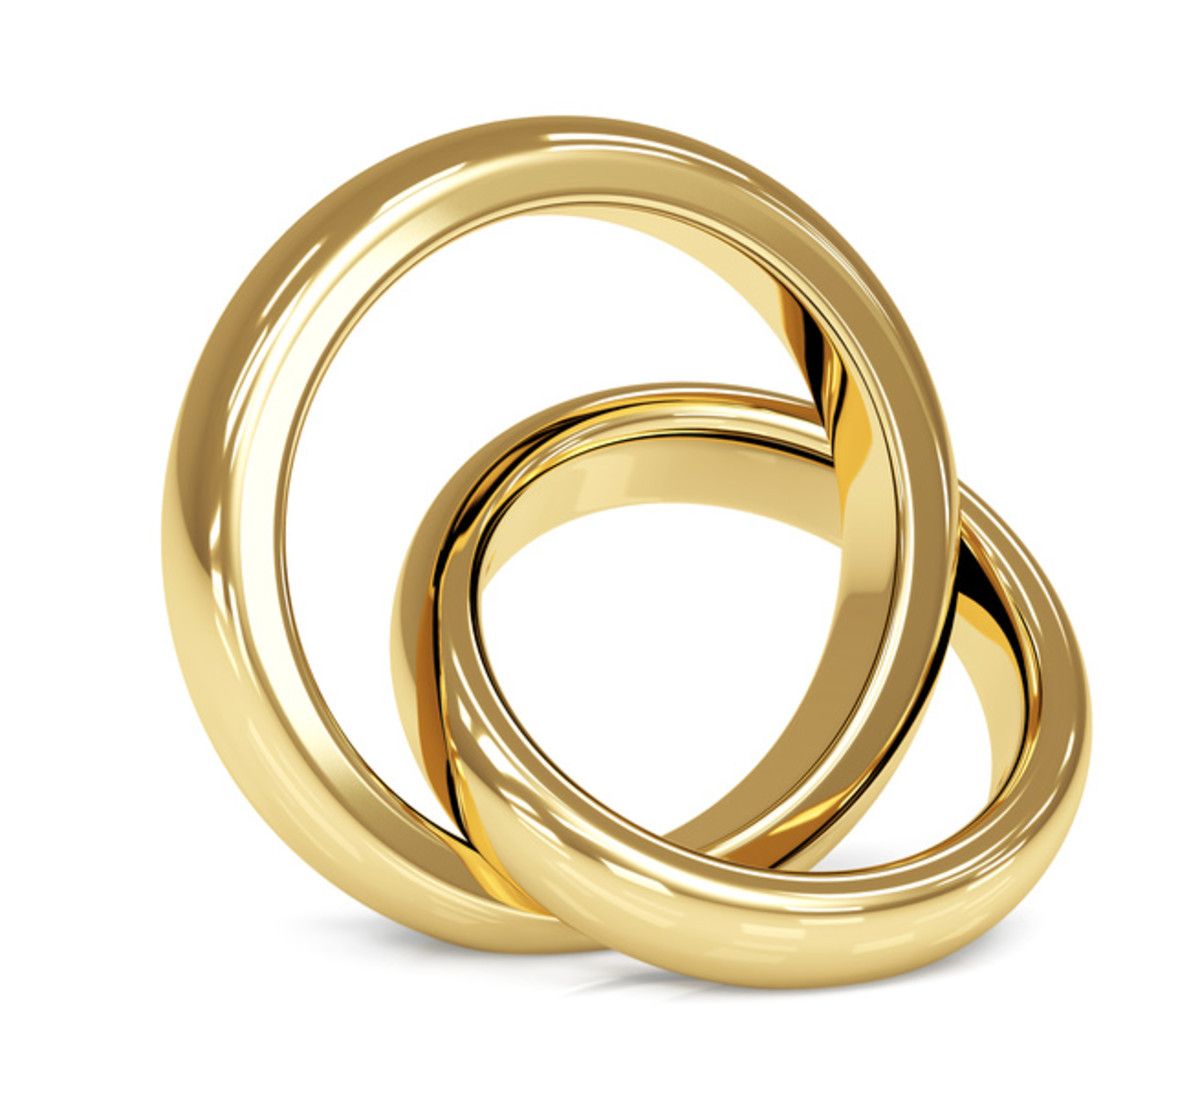 Ideas for Engraving Wedding Rings  LoveToKnow